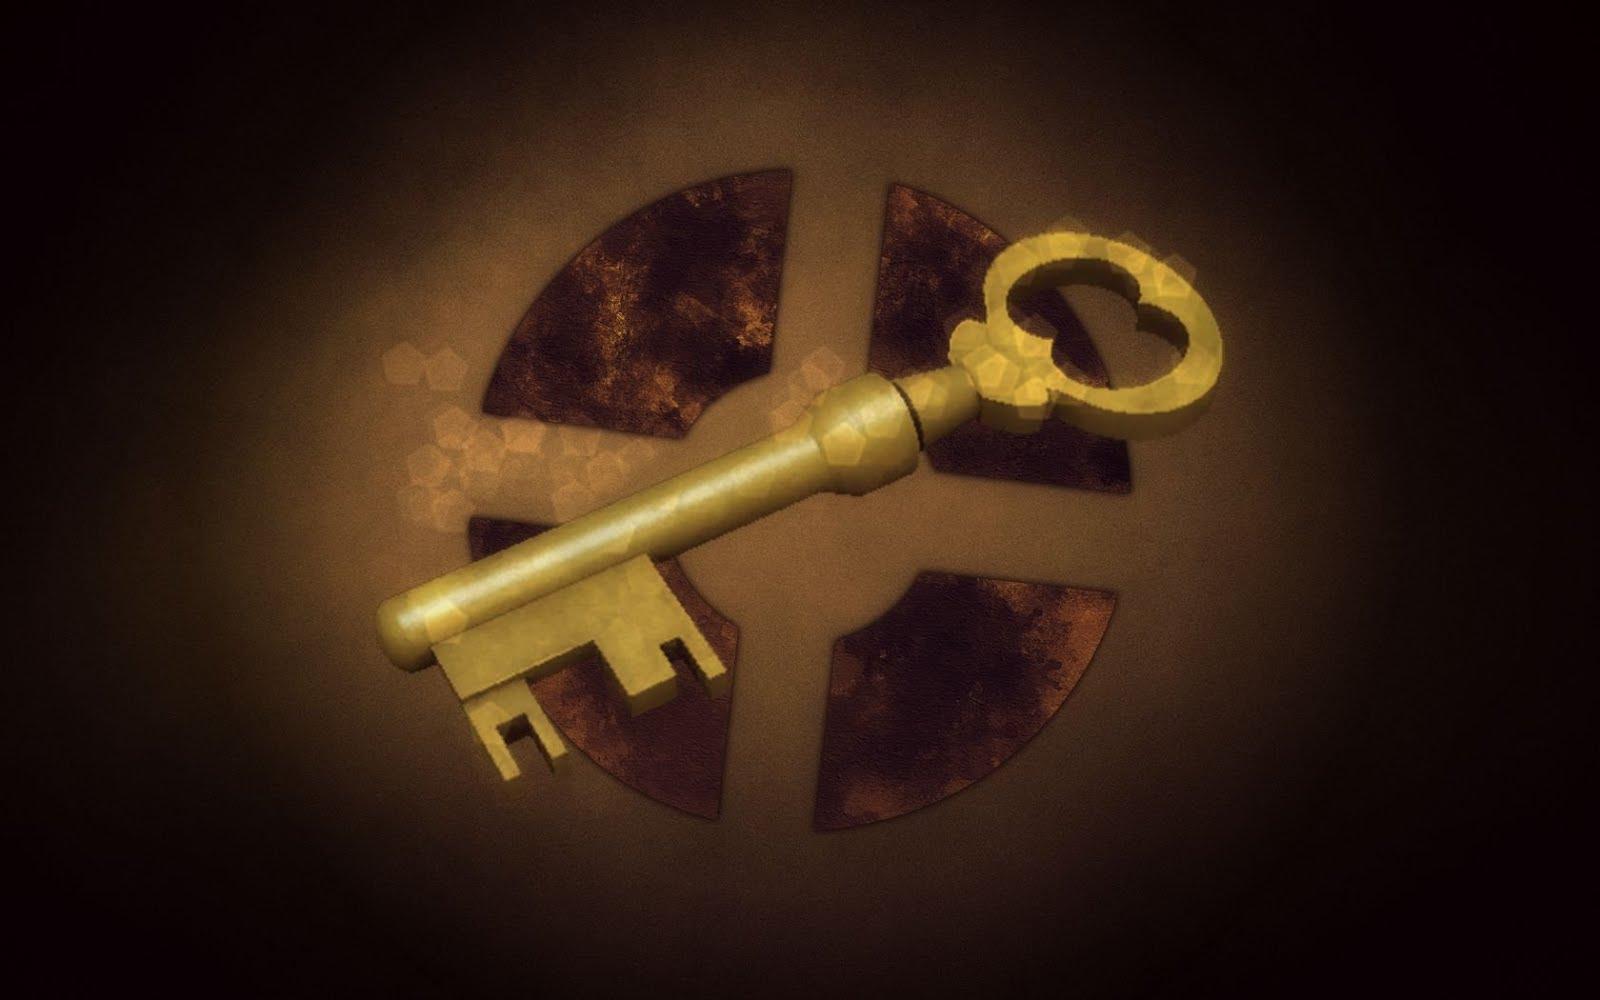 tf2 key generator download